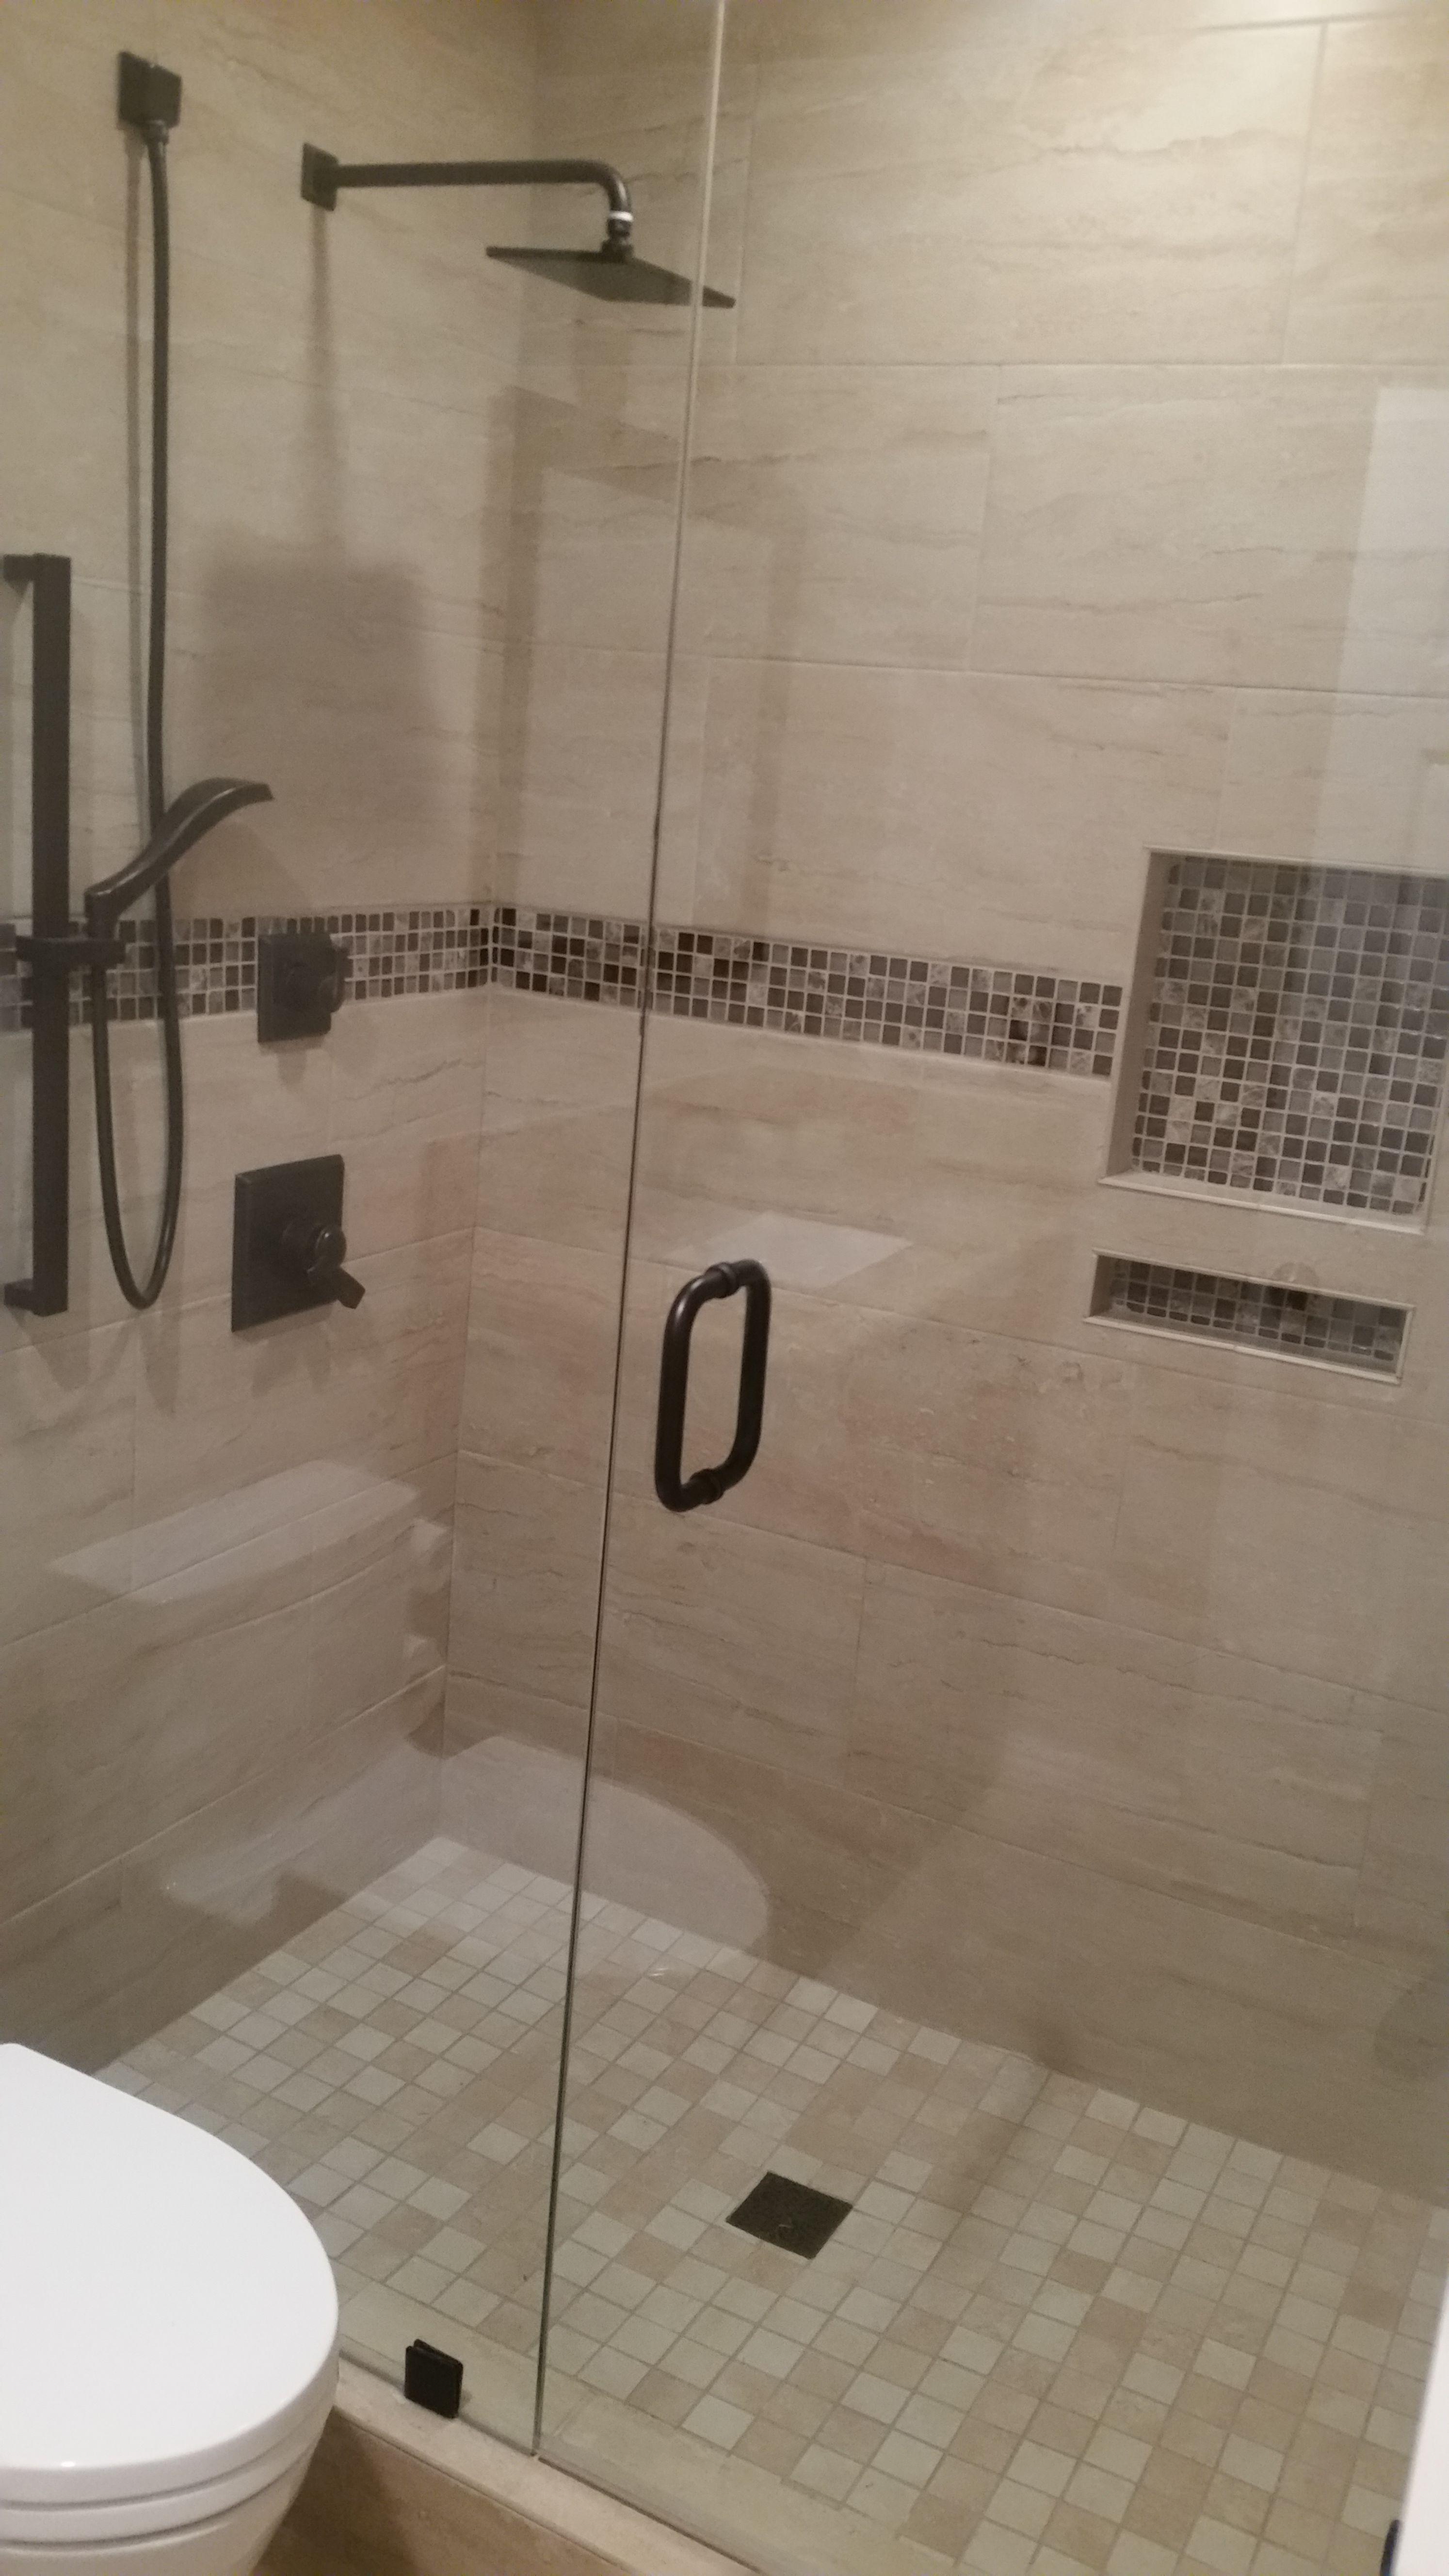 Home Bathrooms Remodel Construction Remodeling Home Remodeling